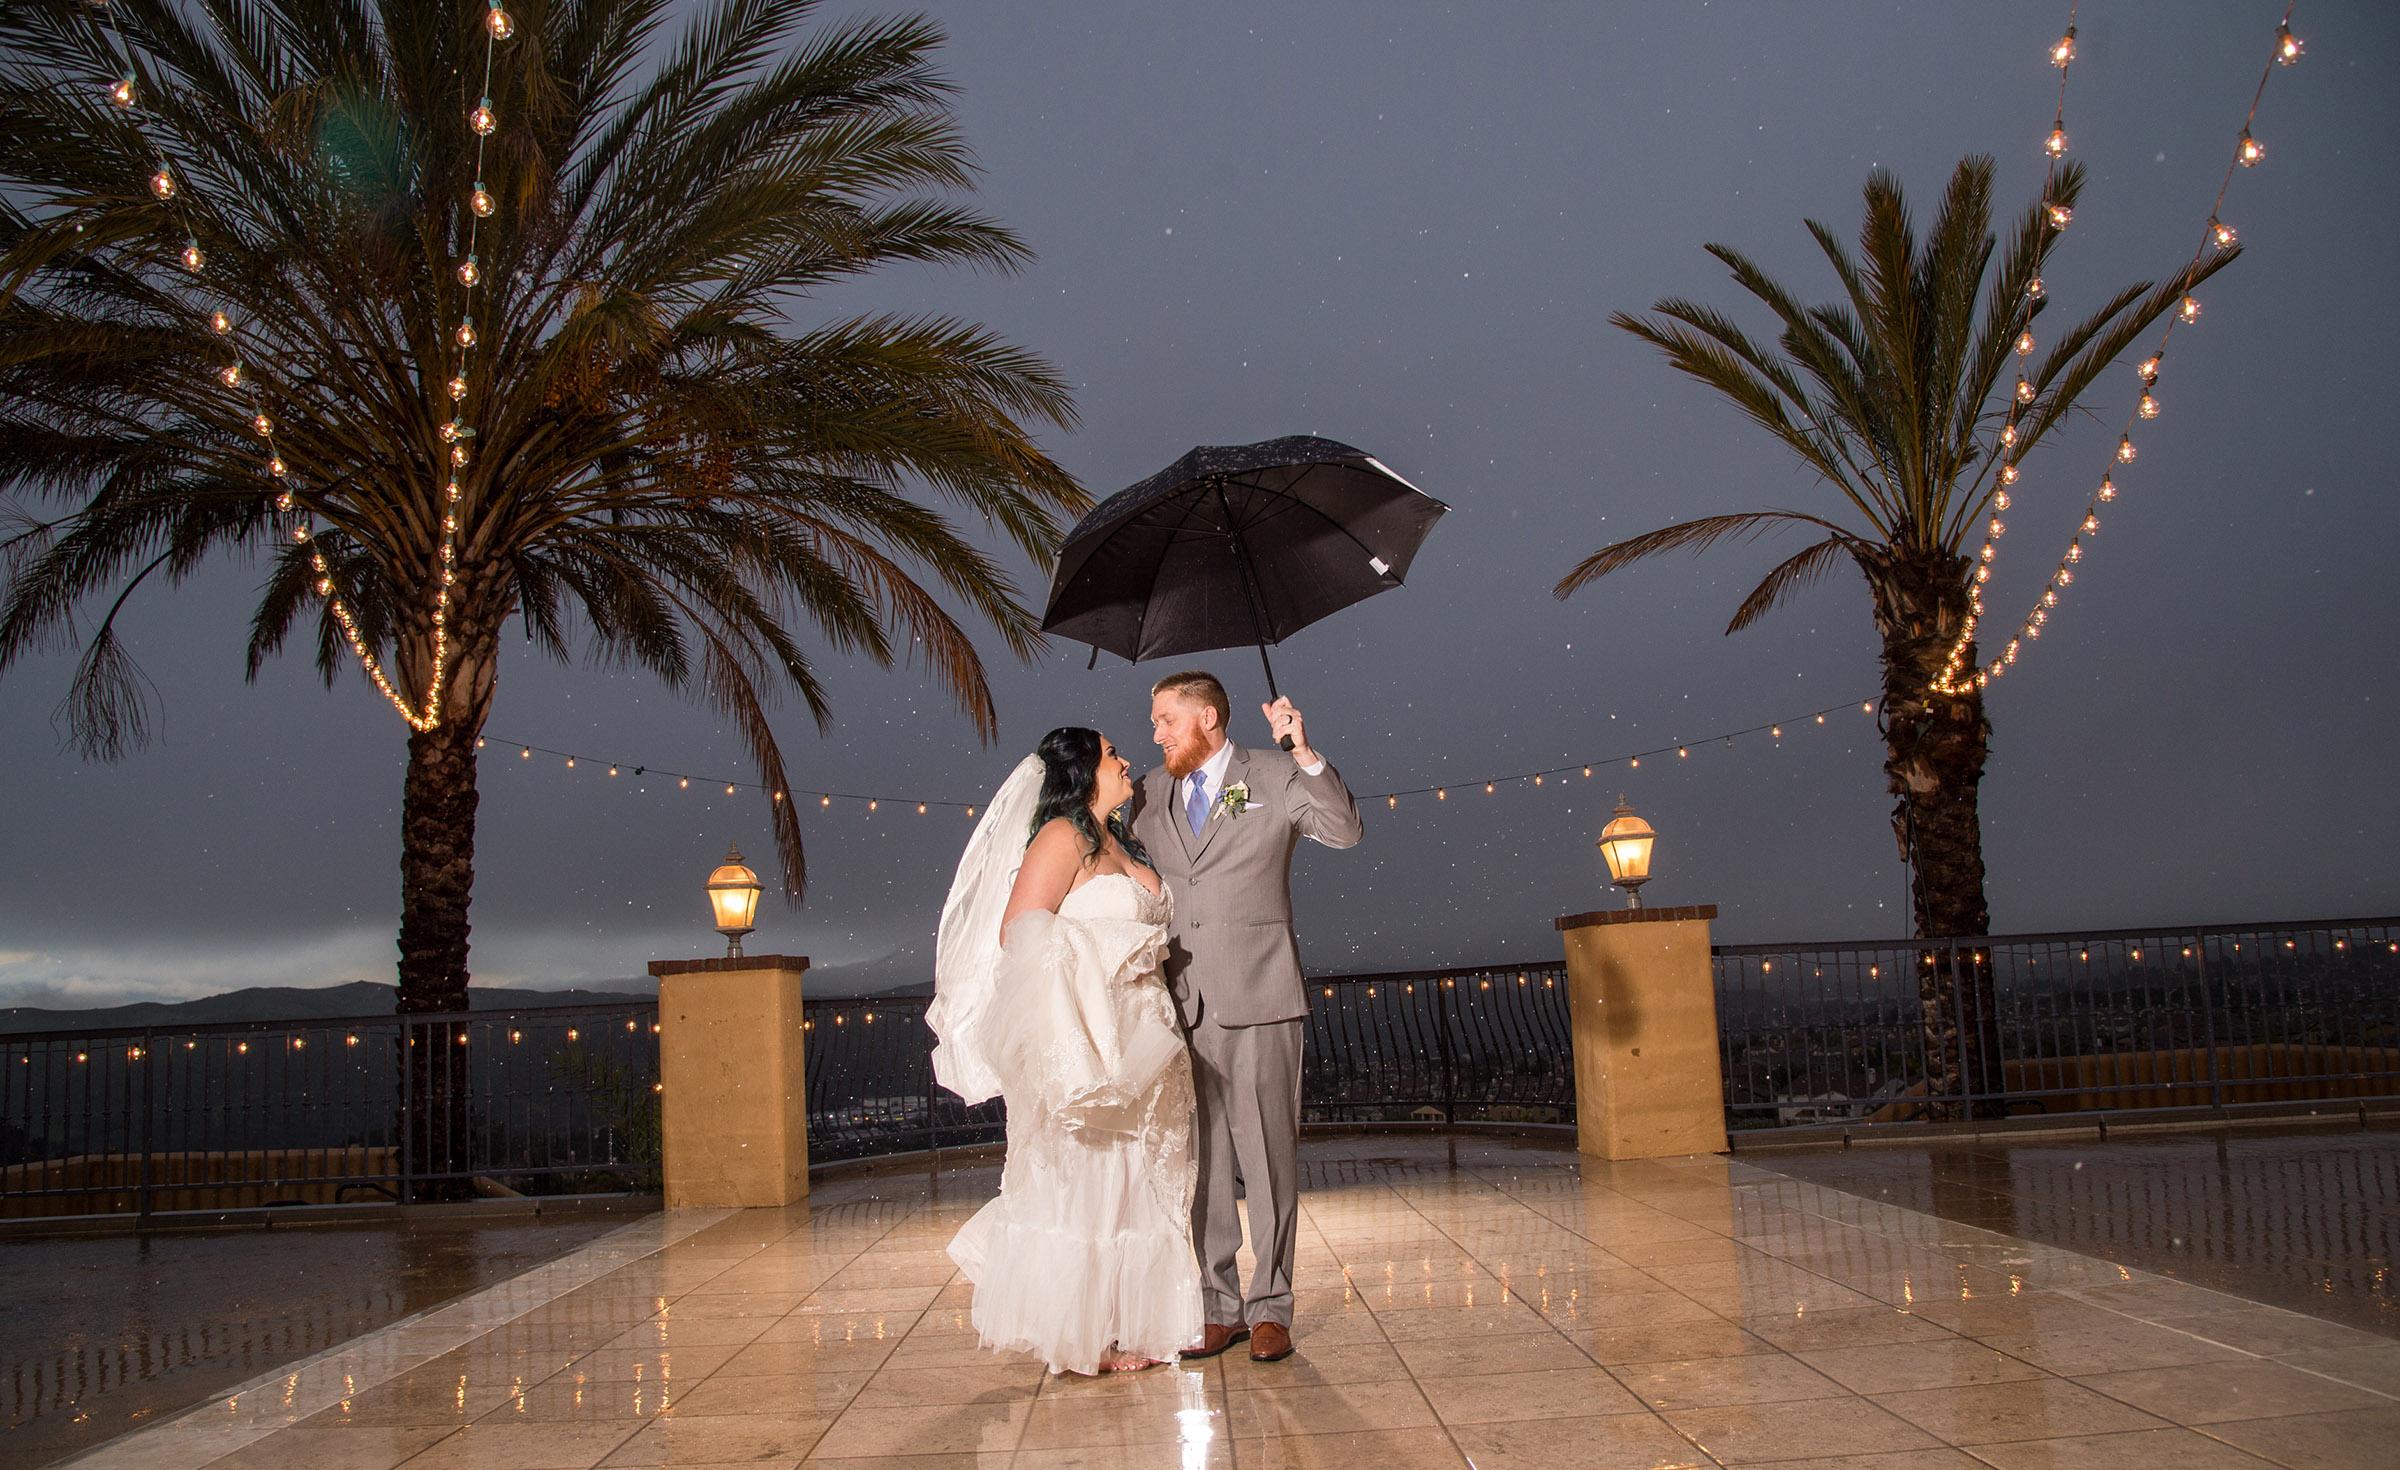 Dancing in the rain - The Retreat - Corona, California - Riverside County - Wedgewood Weddings